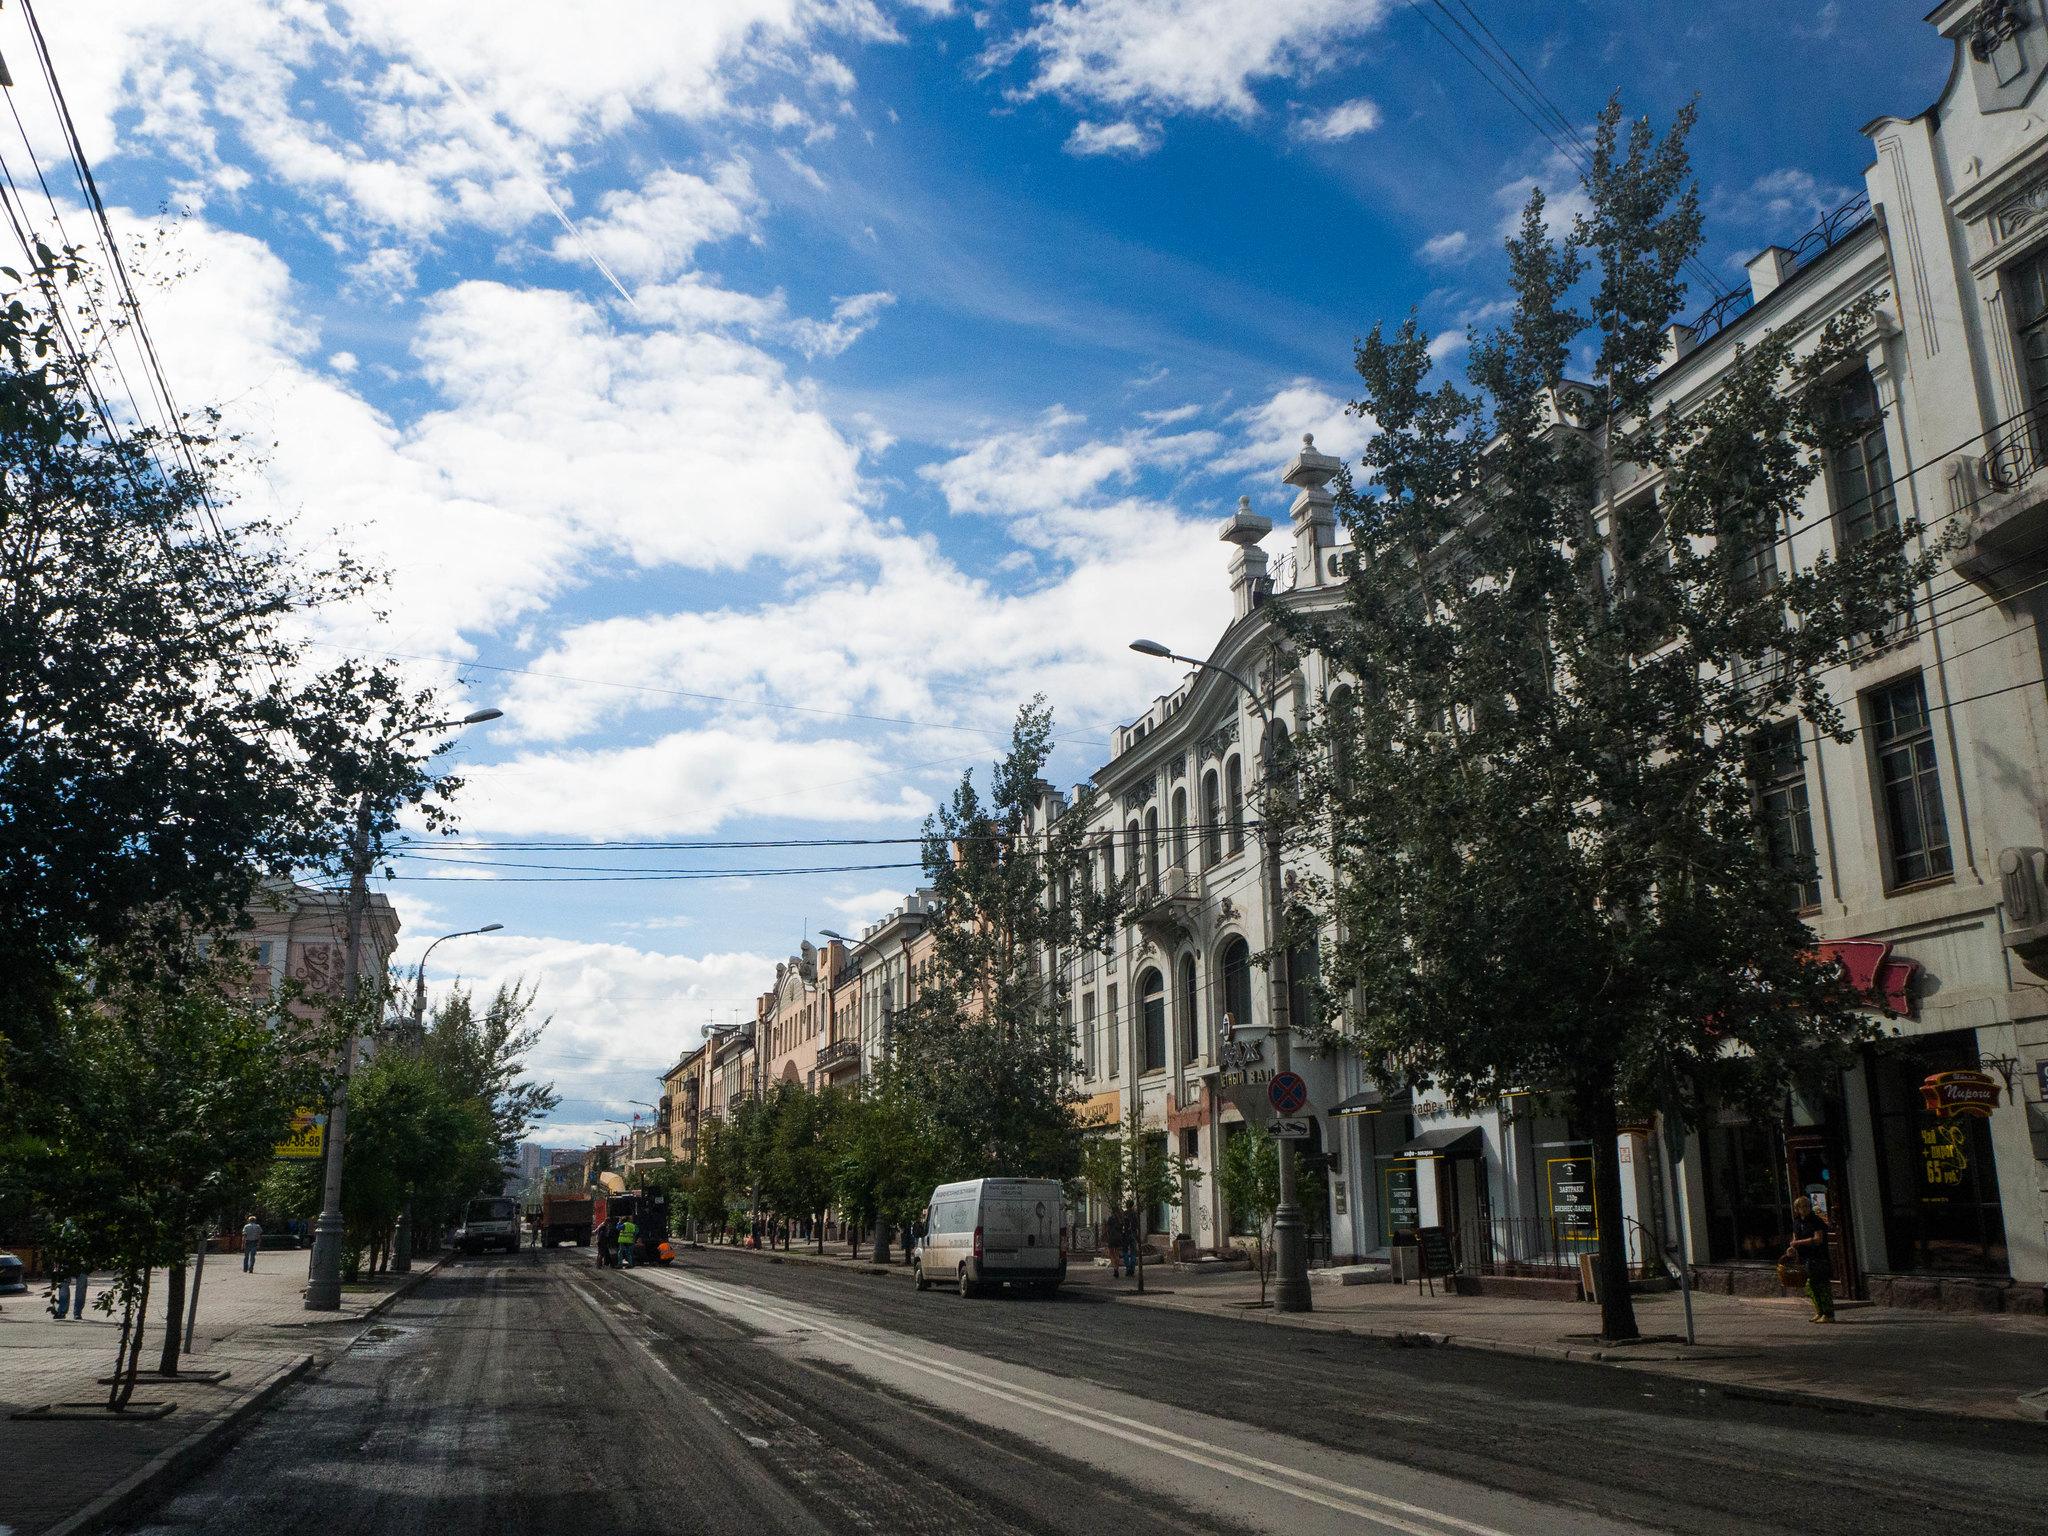 Slunečná ulice Krasnojarsku // Sunny street of Krasnoyarsk